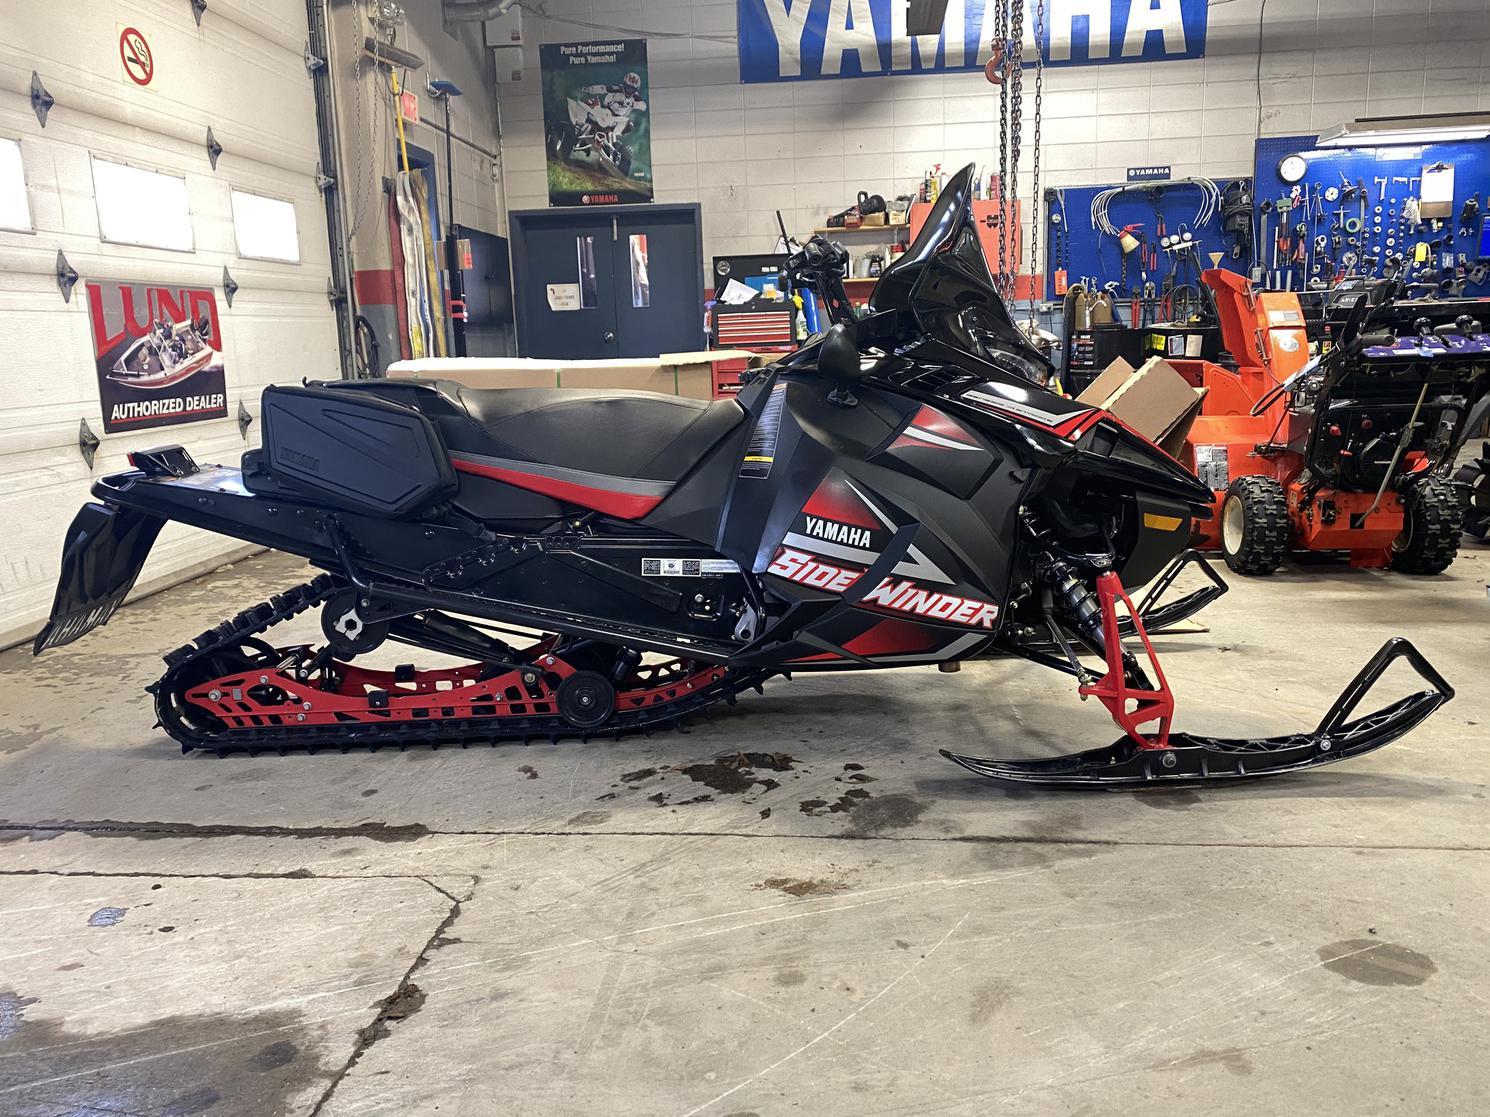 2017 Yamaha Sidewinder Stx-dx